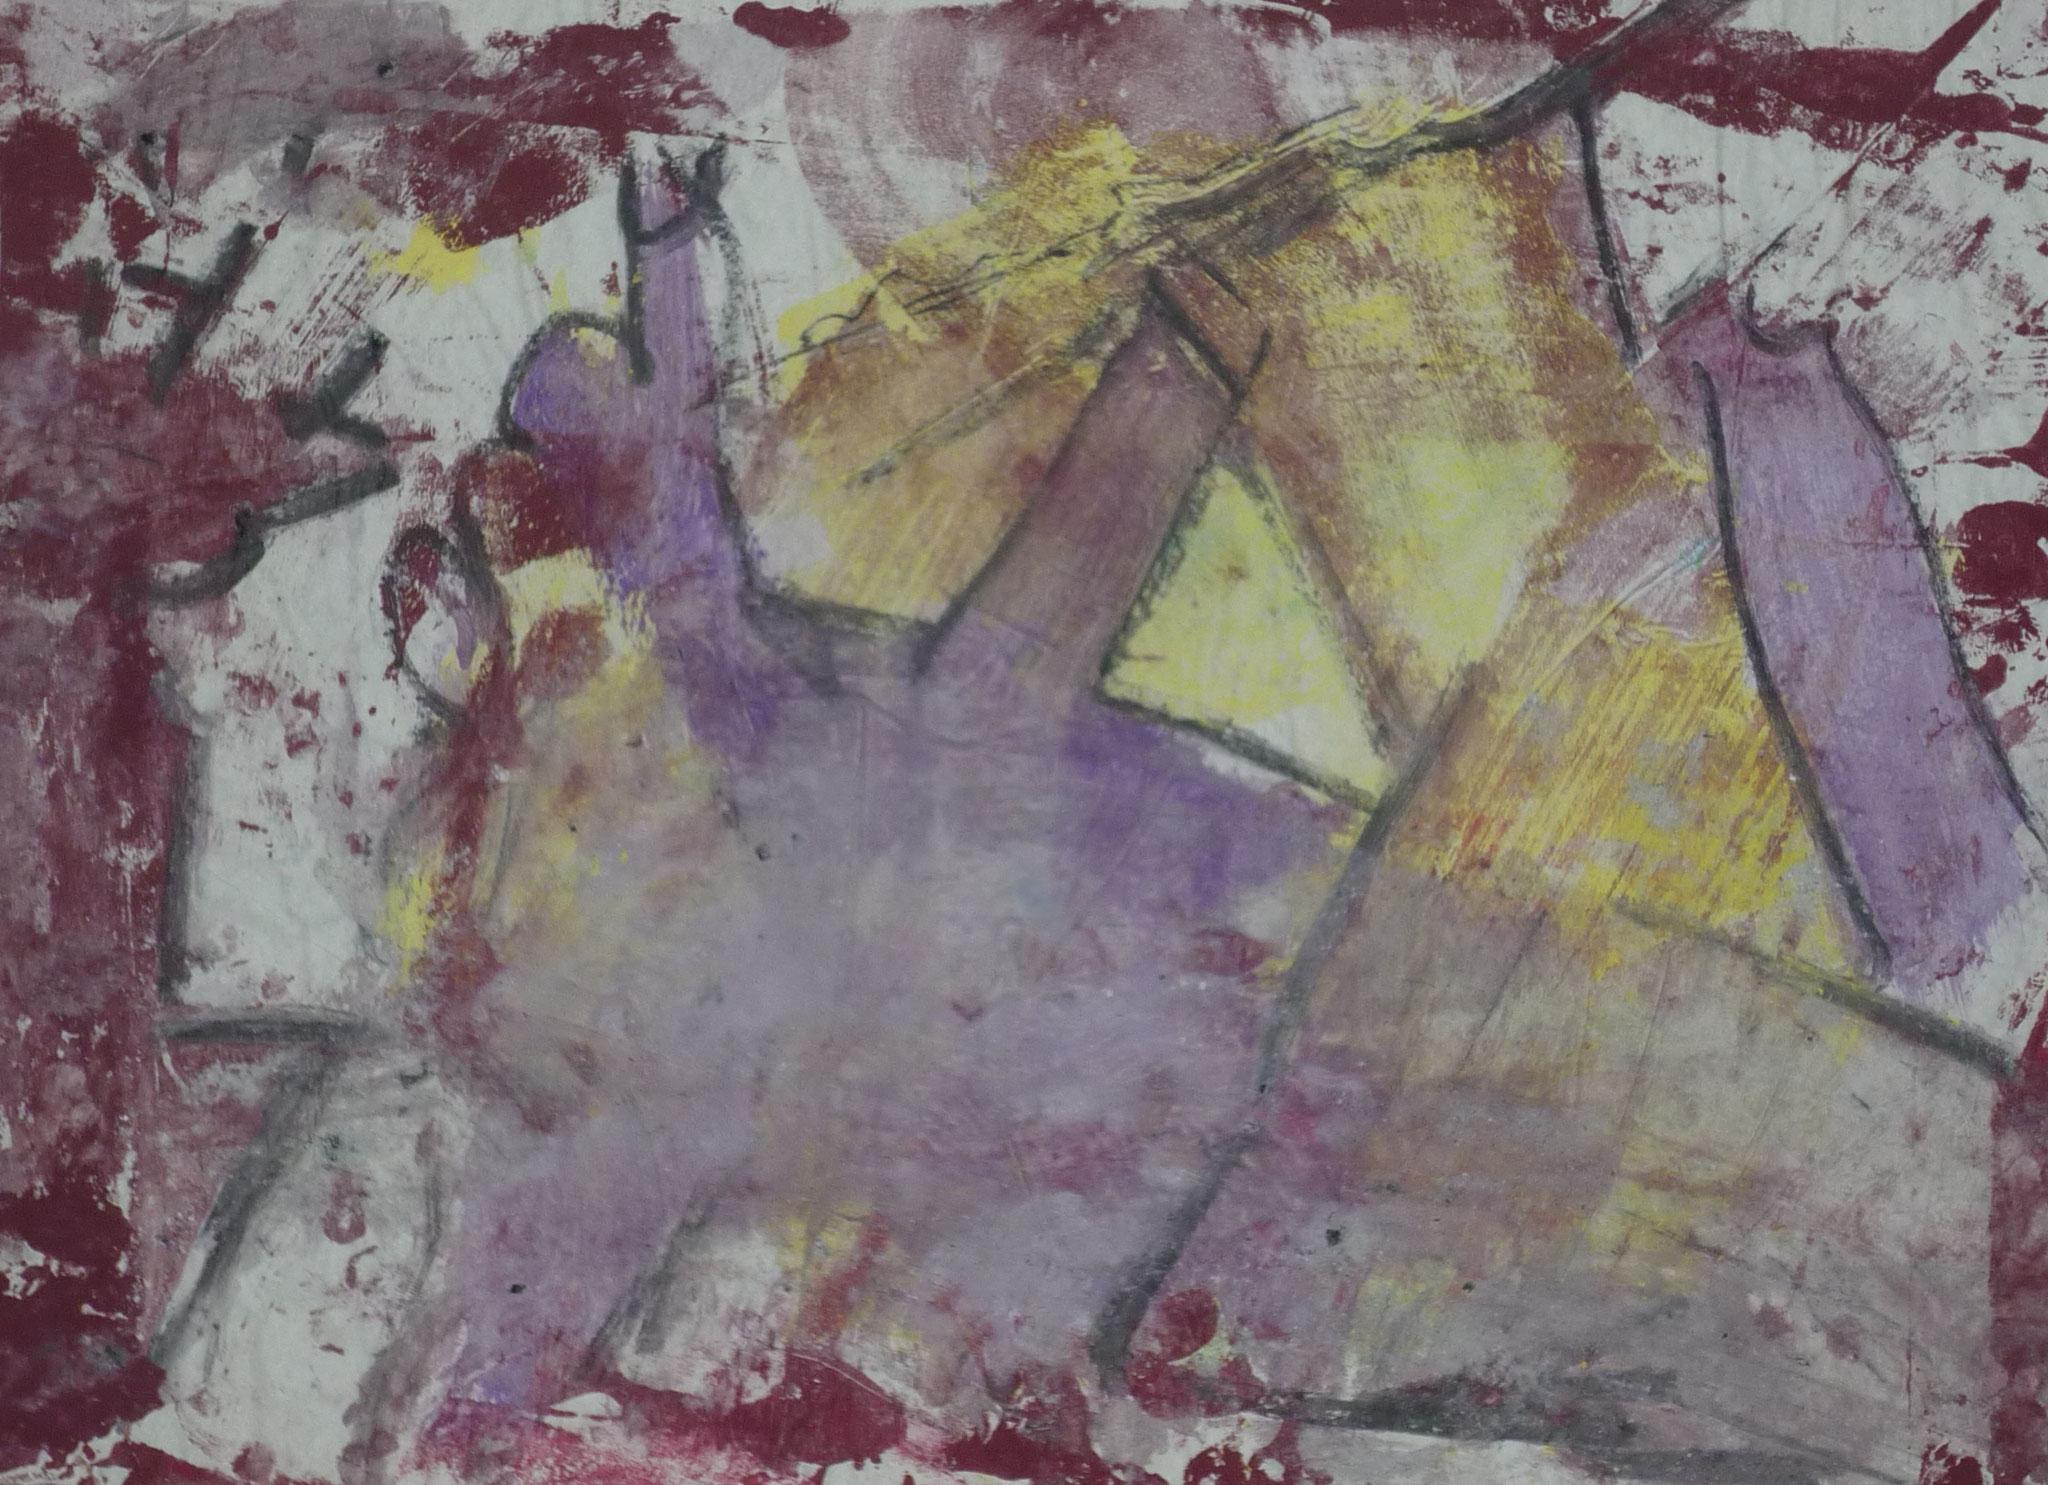 Kleine Monster V, 2001, 50x37, Transparentpapier